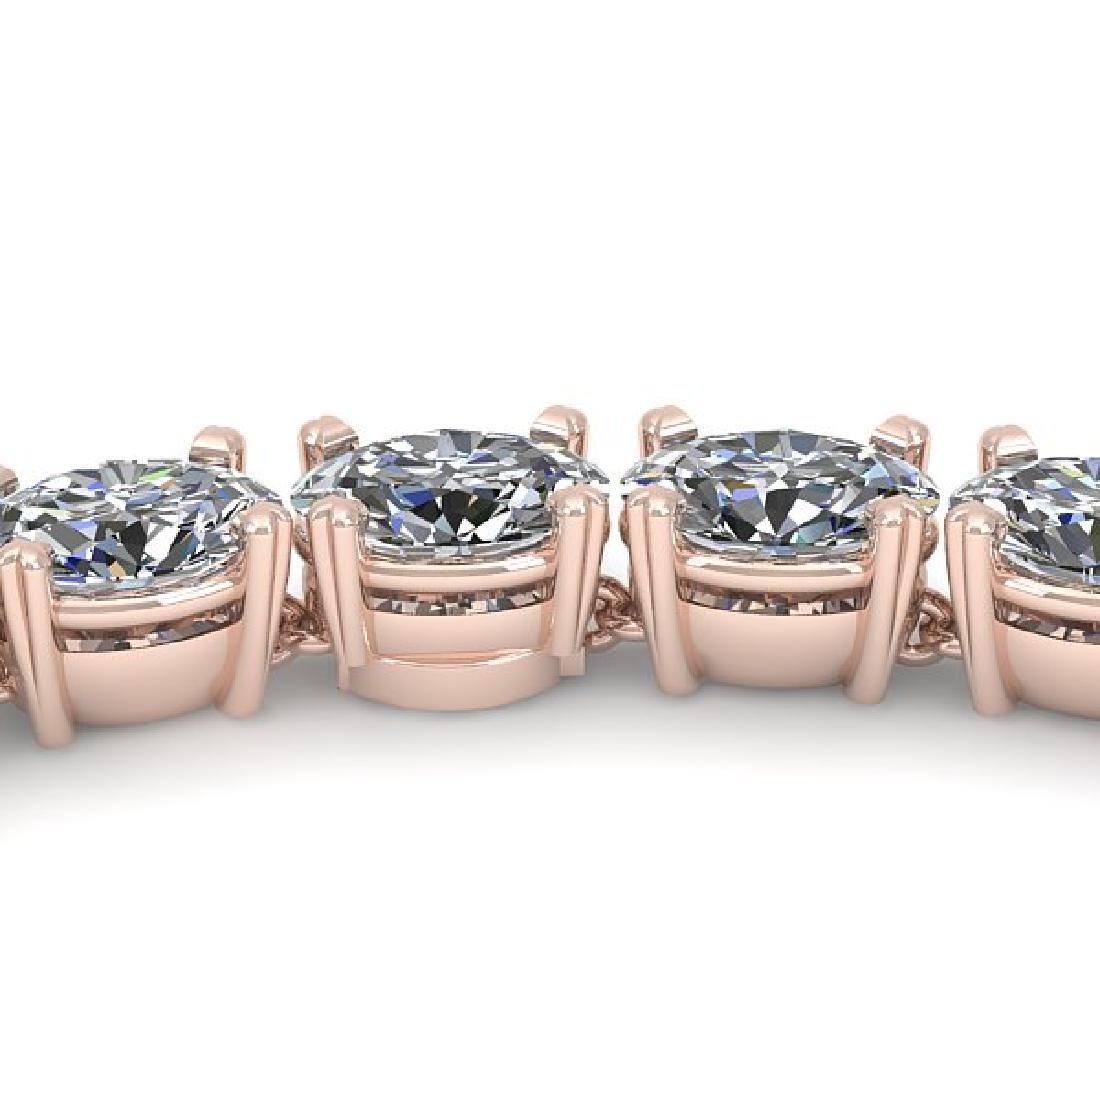 35 CTW Oval Cut Certified SI Diamond Necklace 18K Rose